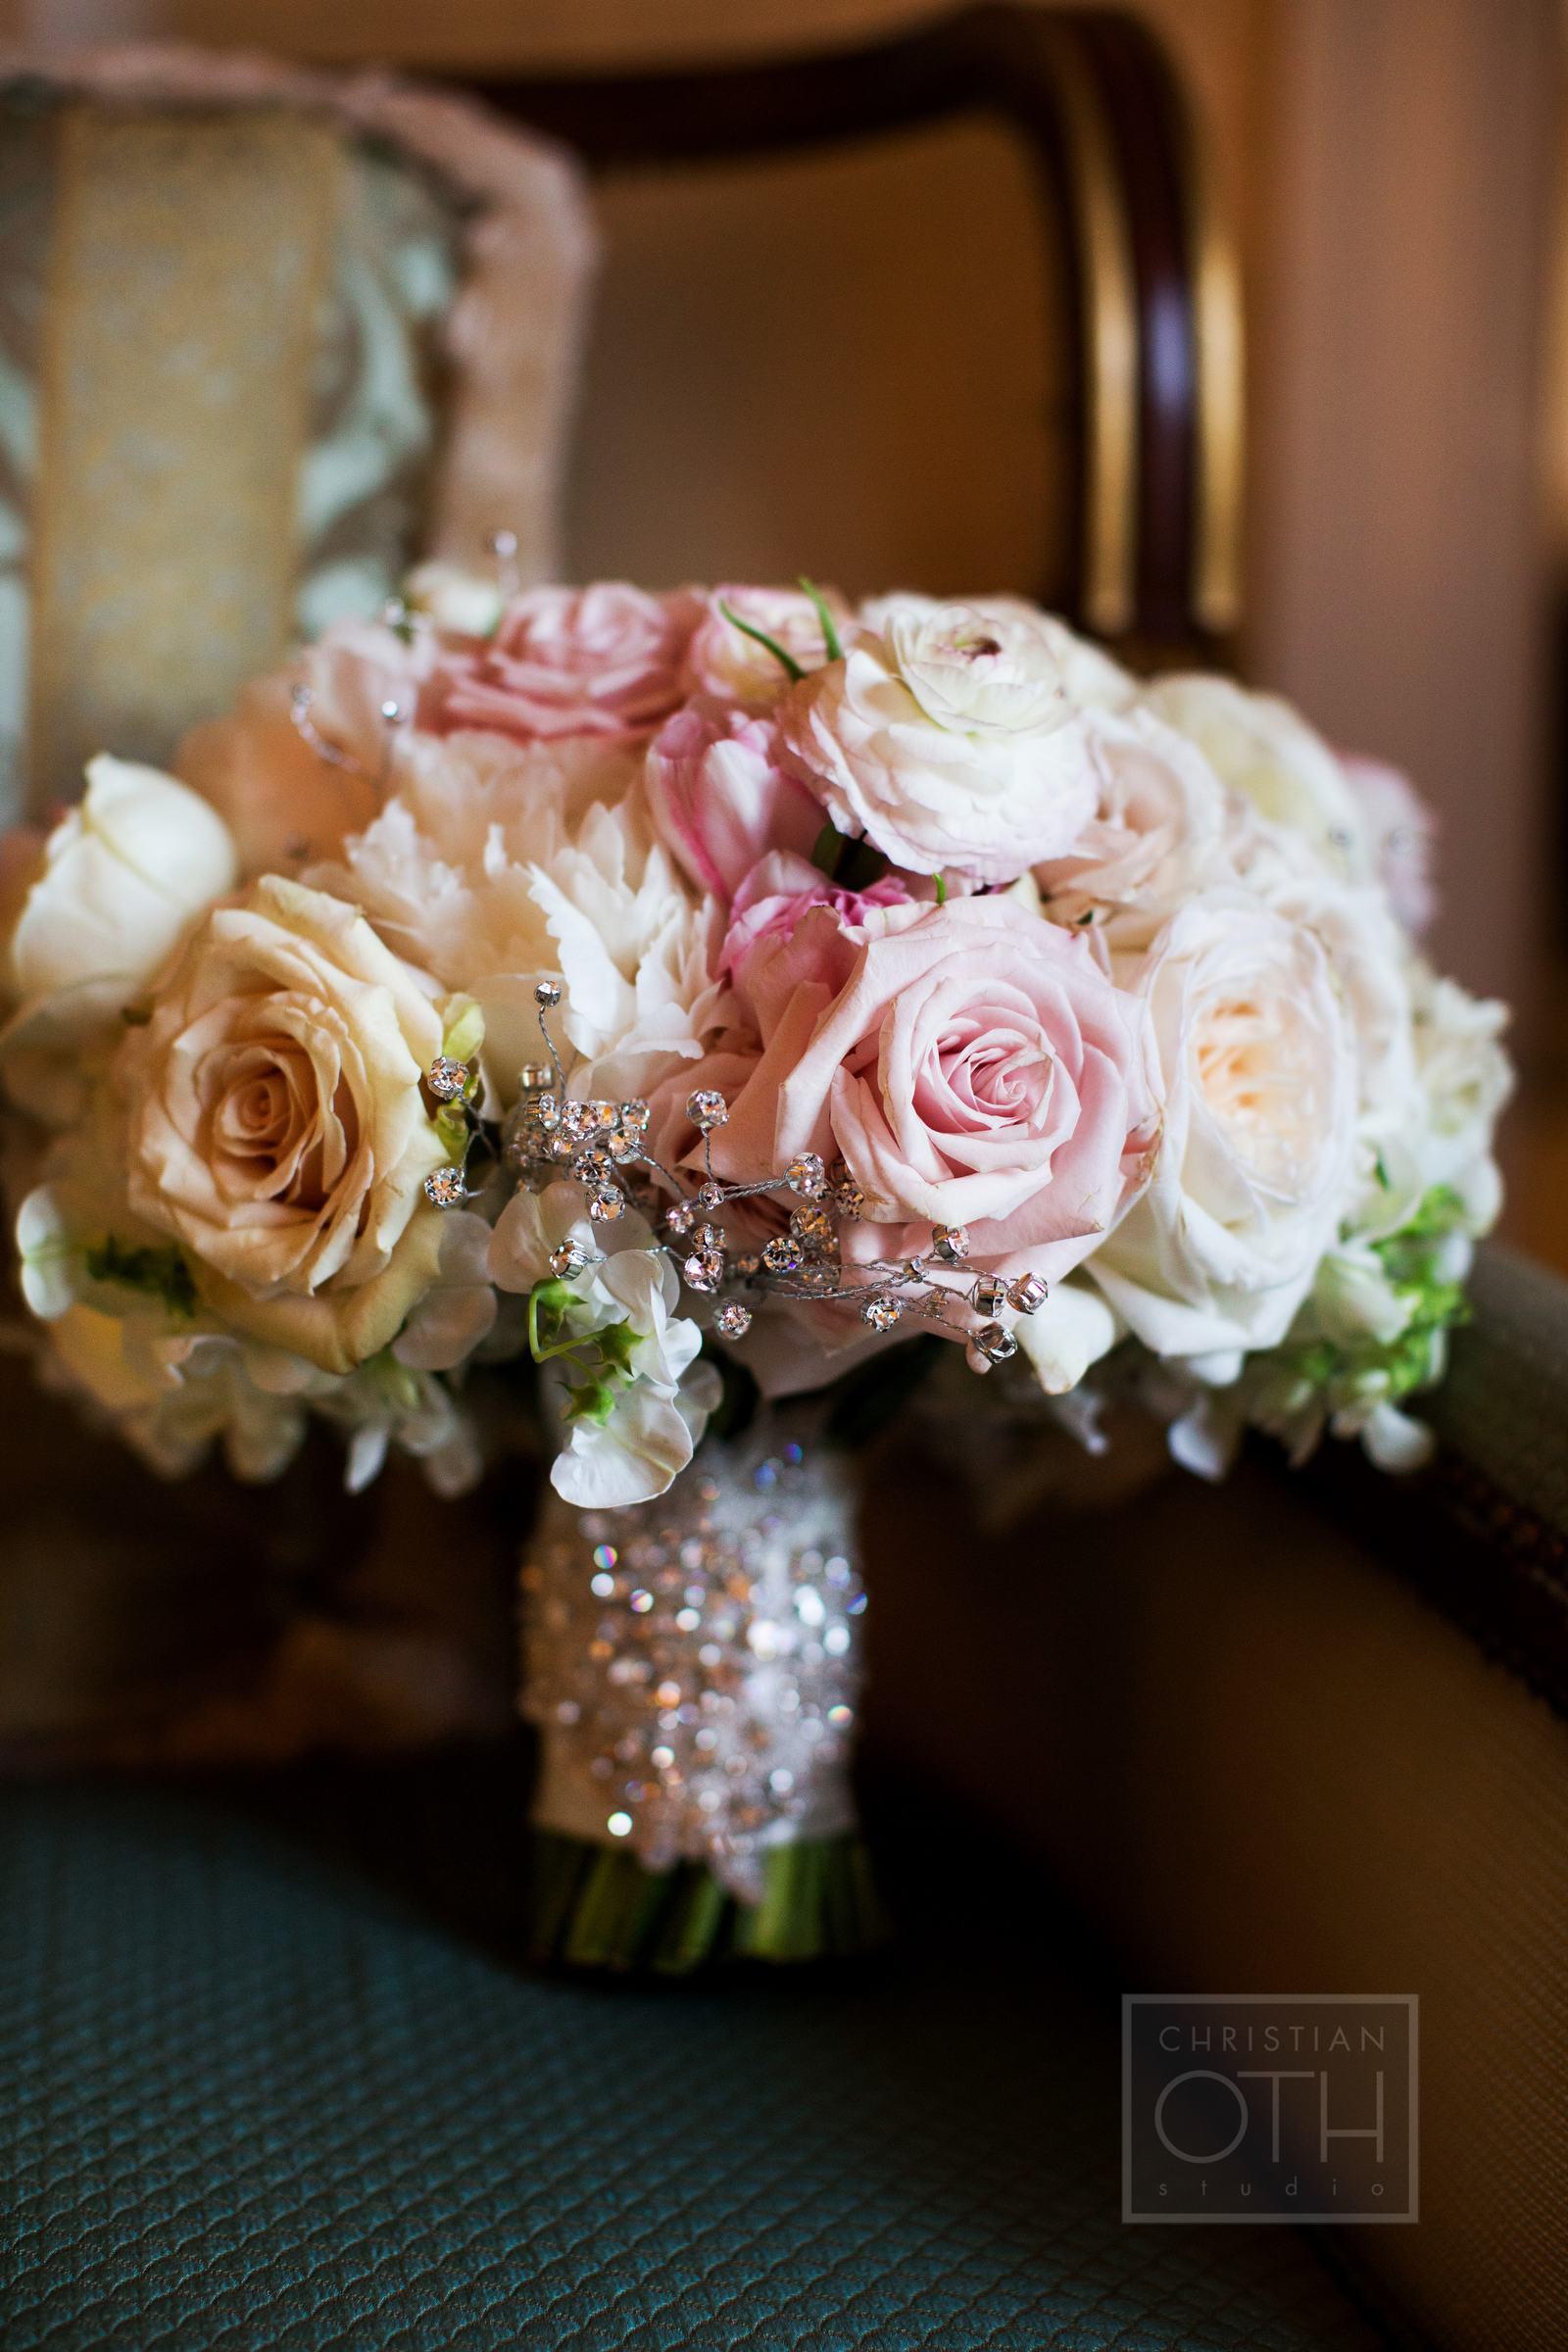 Ceci_New_York_Custom_Invitation_Pierre__City_ Destination_Wedding_Luxury_Personalized_Ceci_Style_Bride_Rose_Gold_Foil_Stamping8.JPG